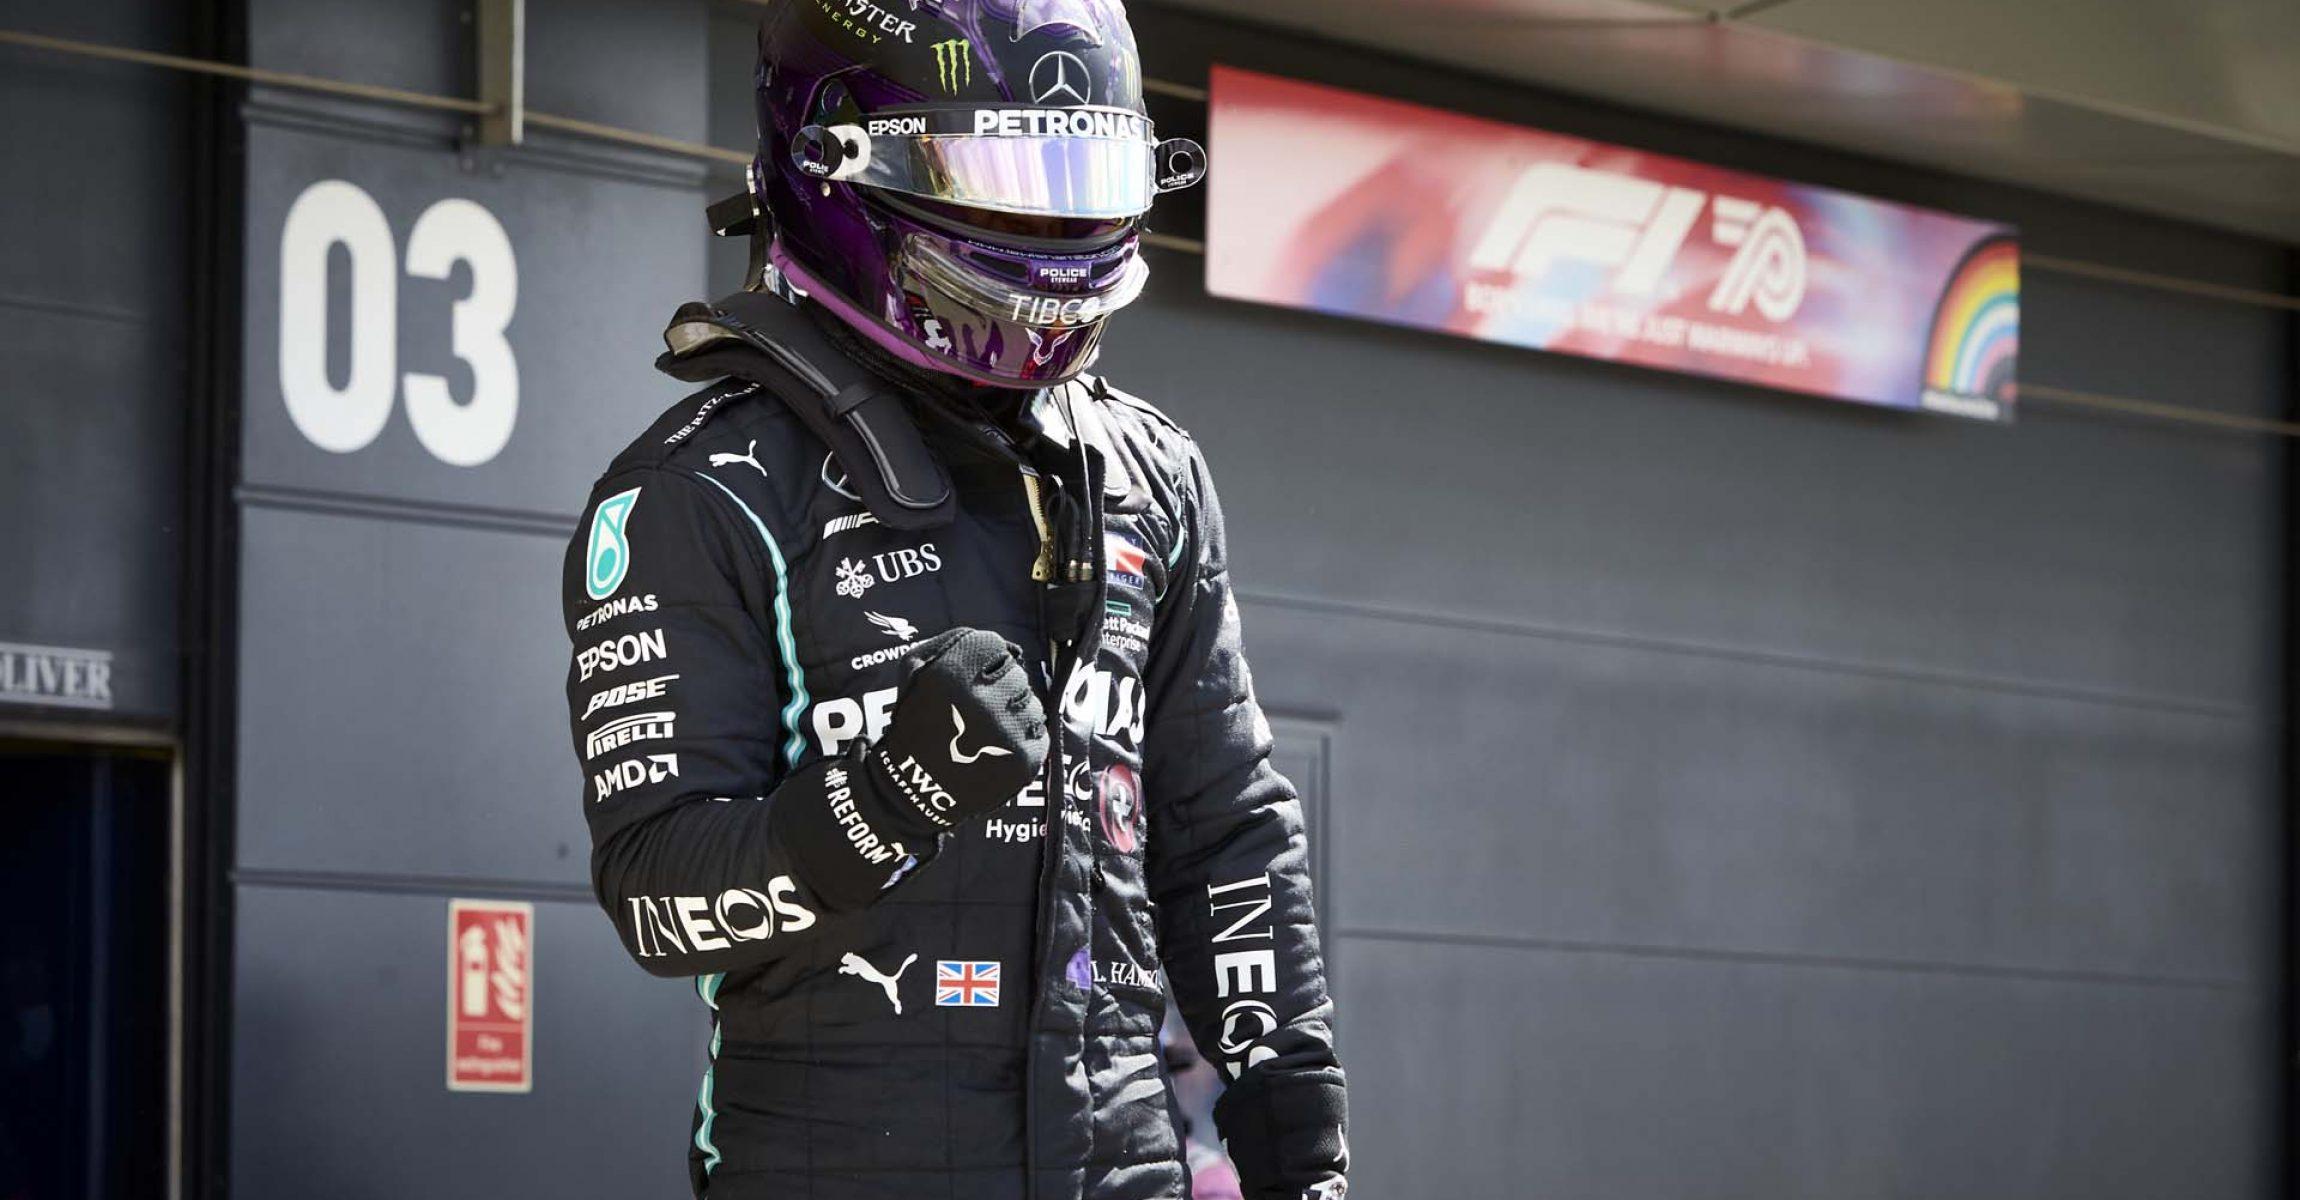 2020 British Grand Prix, Saturday - Steve Etherington Lewis Hamilton Mercedes